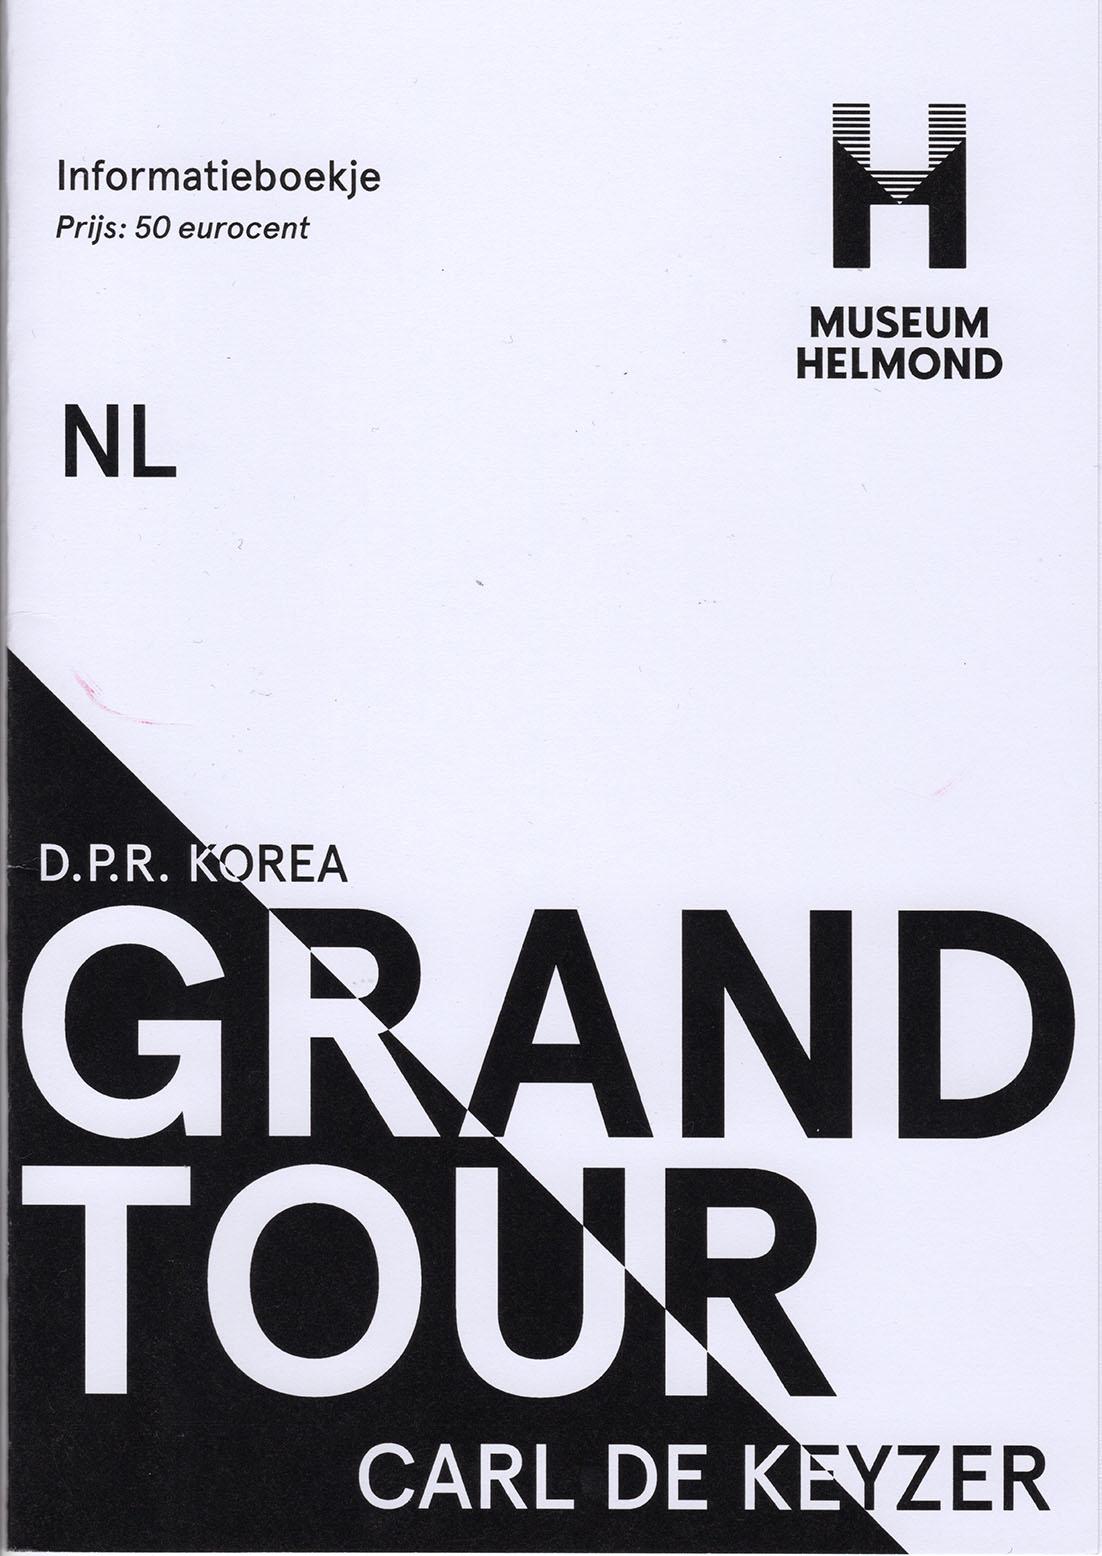 Helmond Museum (DPRK)